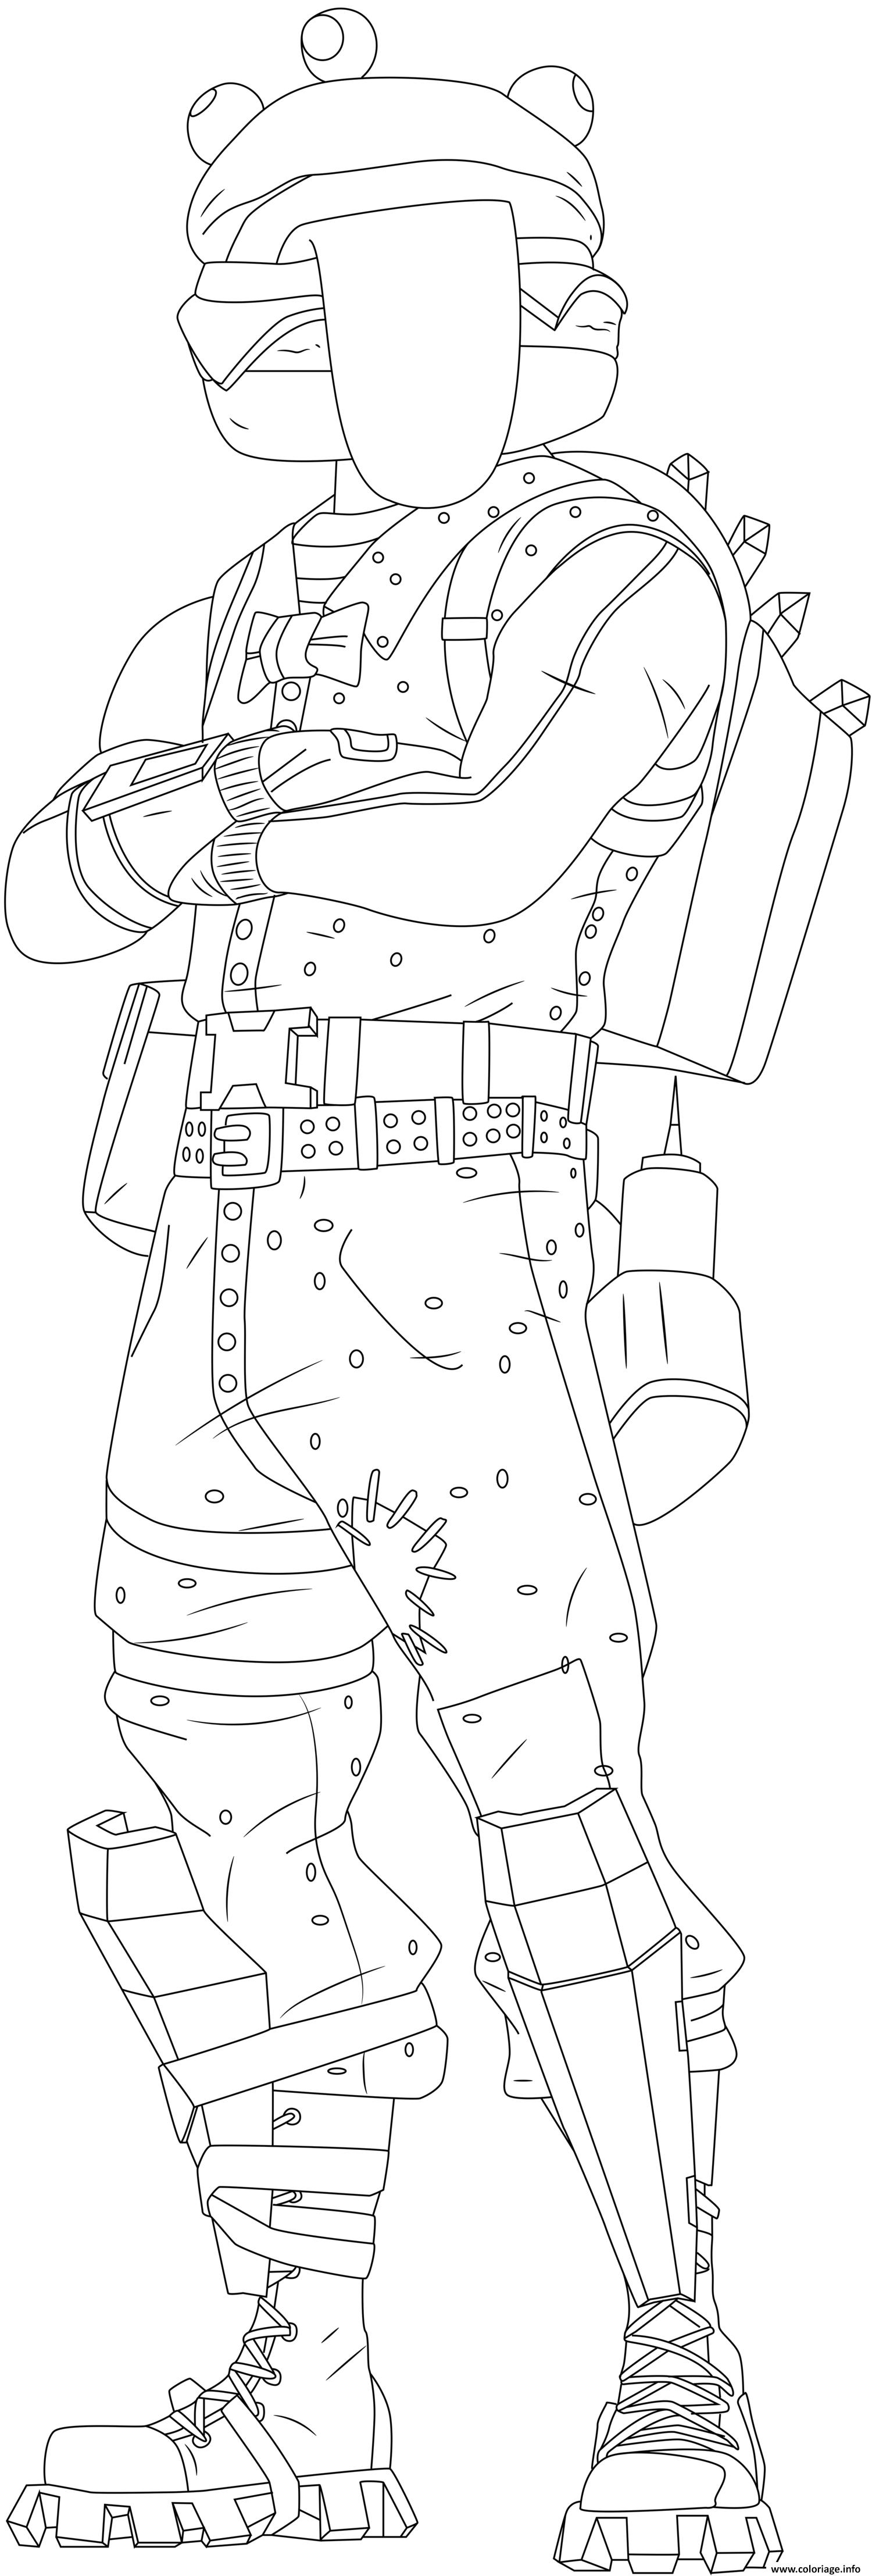 Coloriage Beef Boss Fortnite Skin Hd dessin